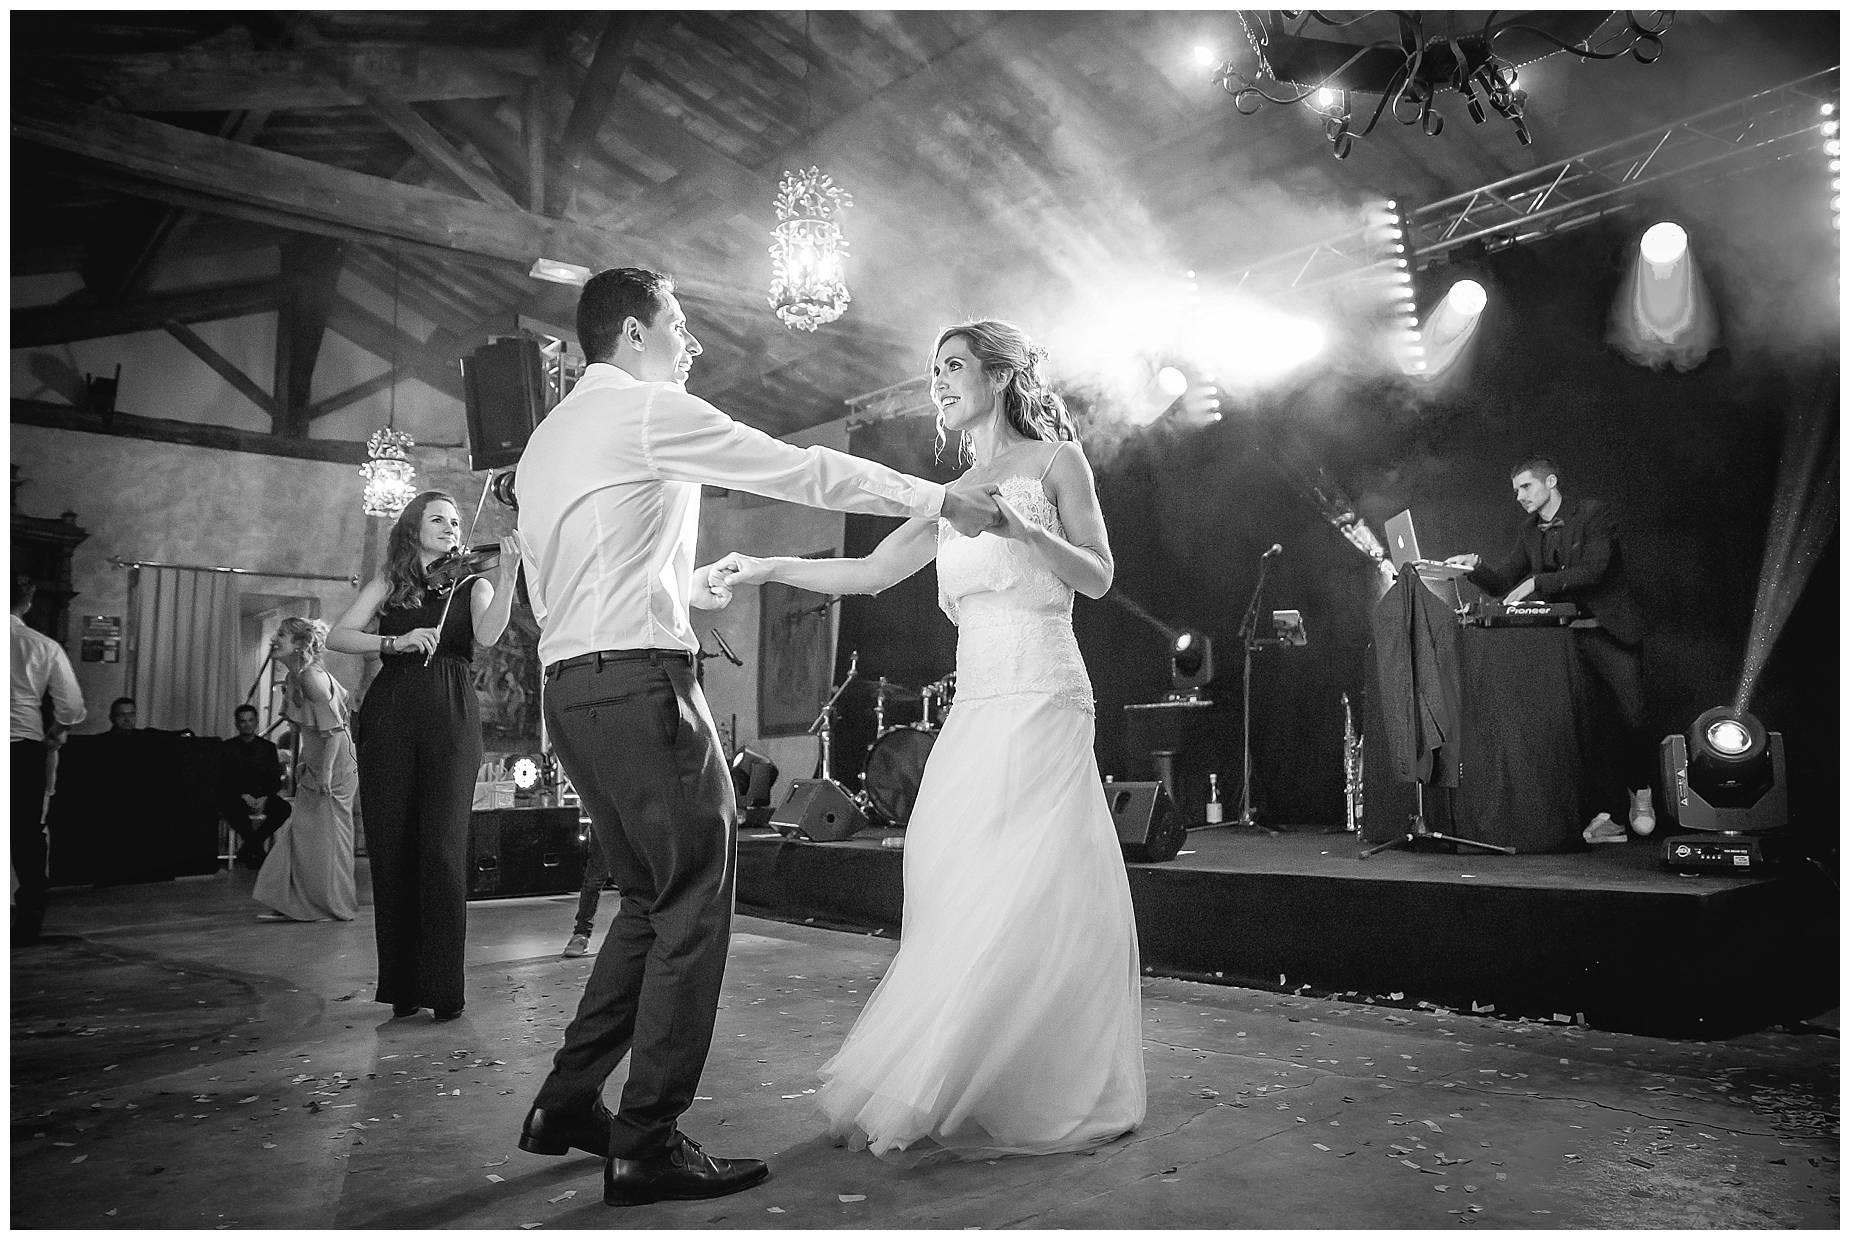 Chateau de Pouget first dance at wedding